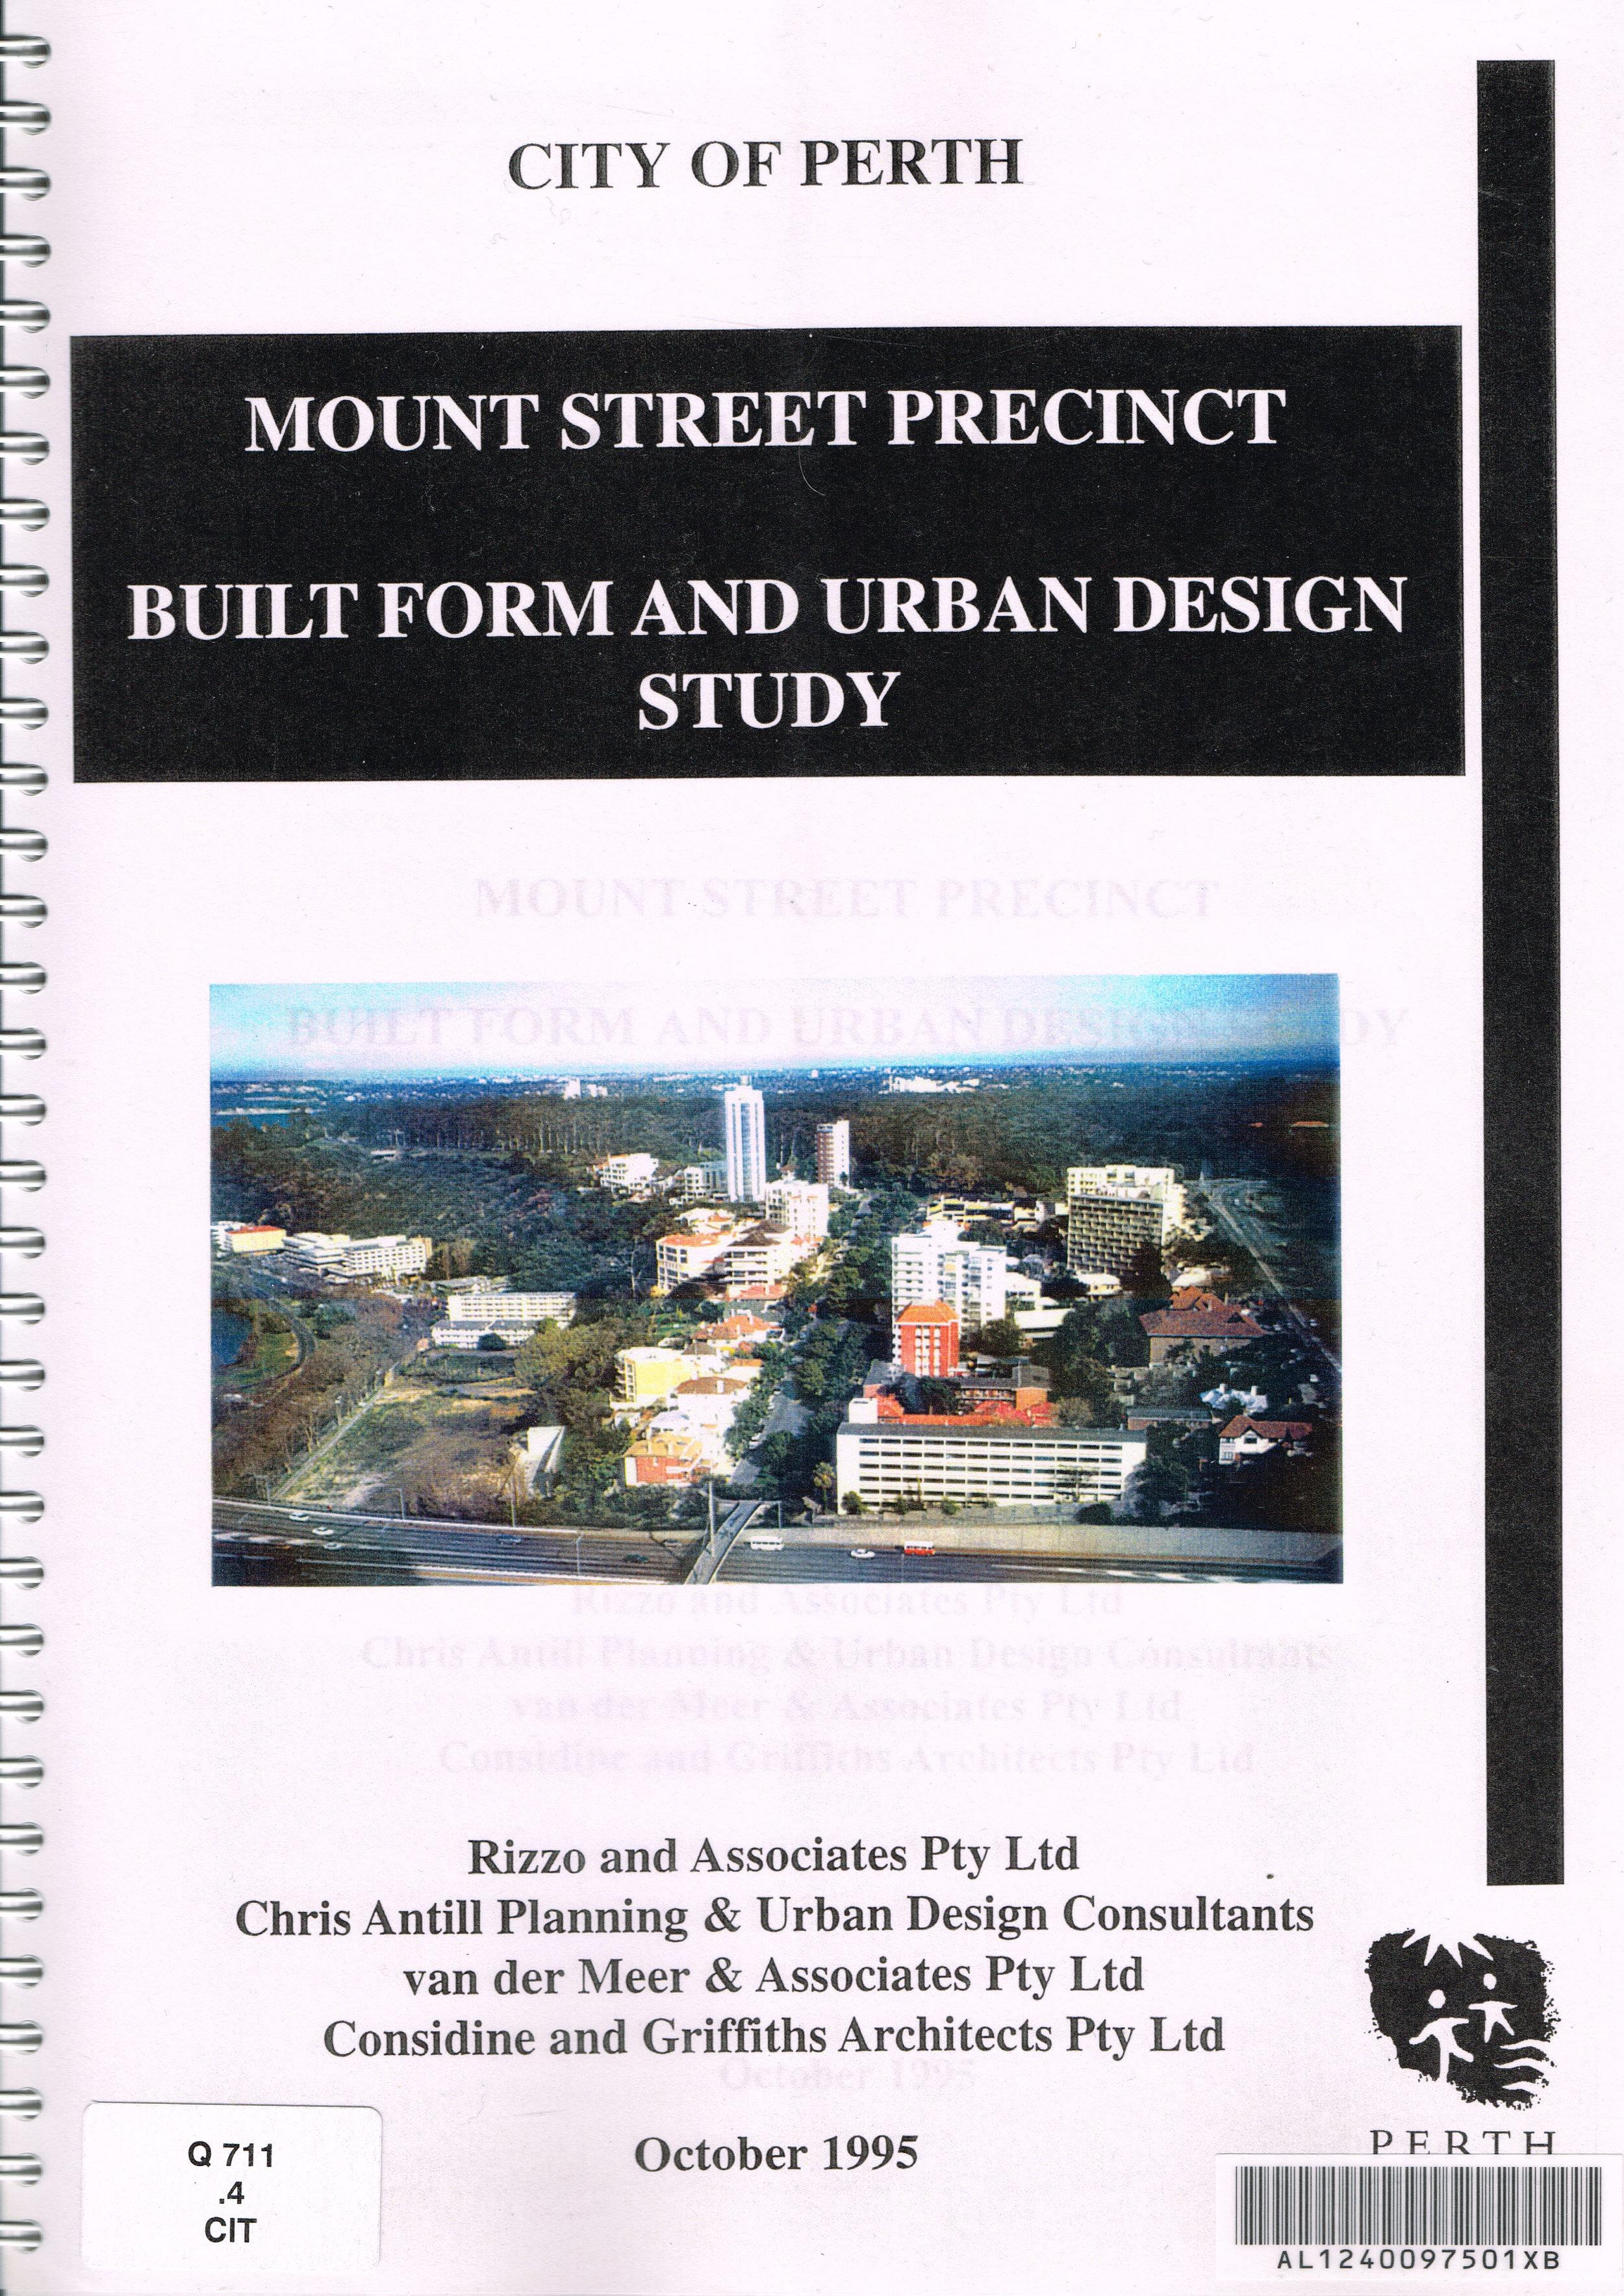 Mount Street Precinct : Built Form and Urban Design Study   Rizzo and Associates Pty. Ltd. ... [et al.]